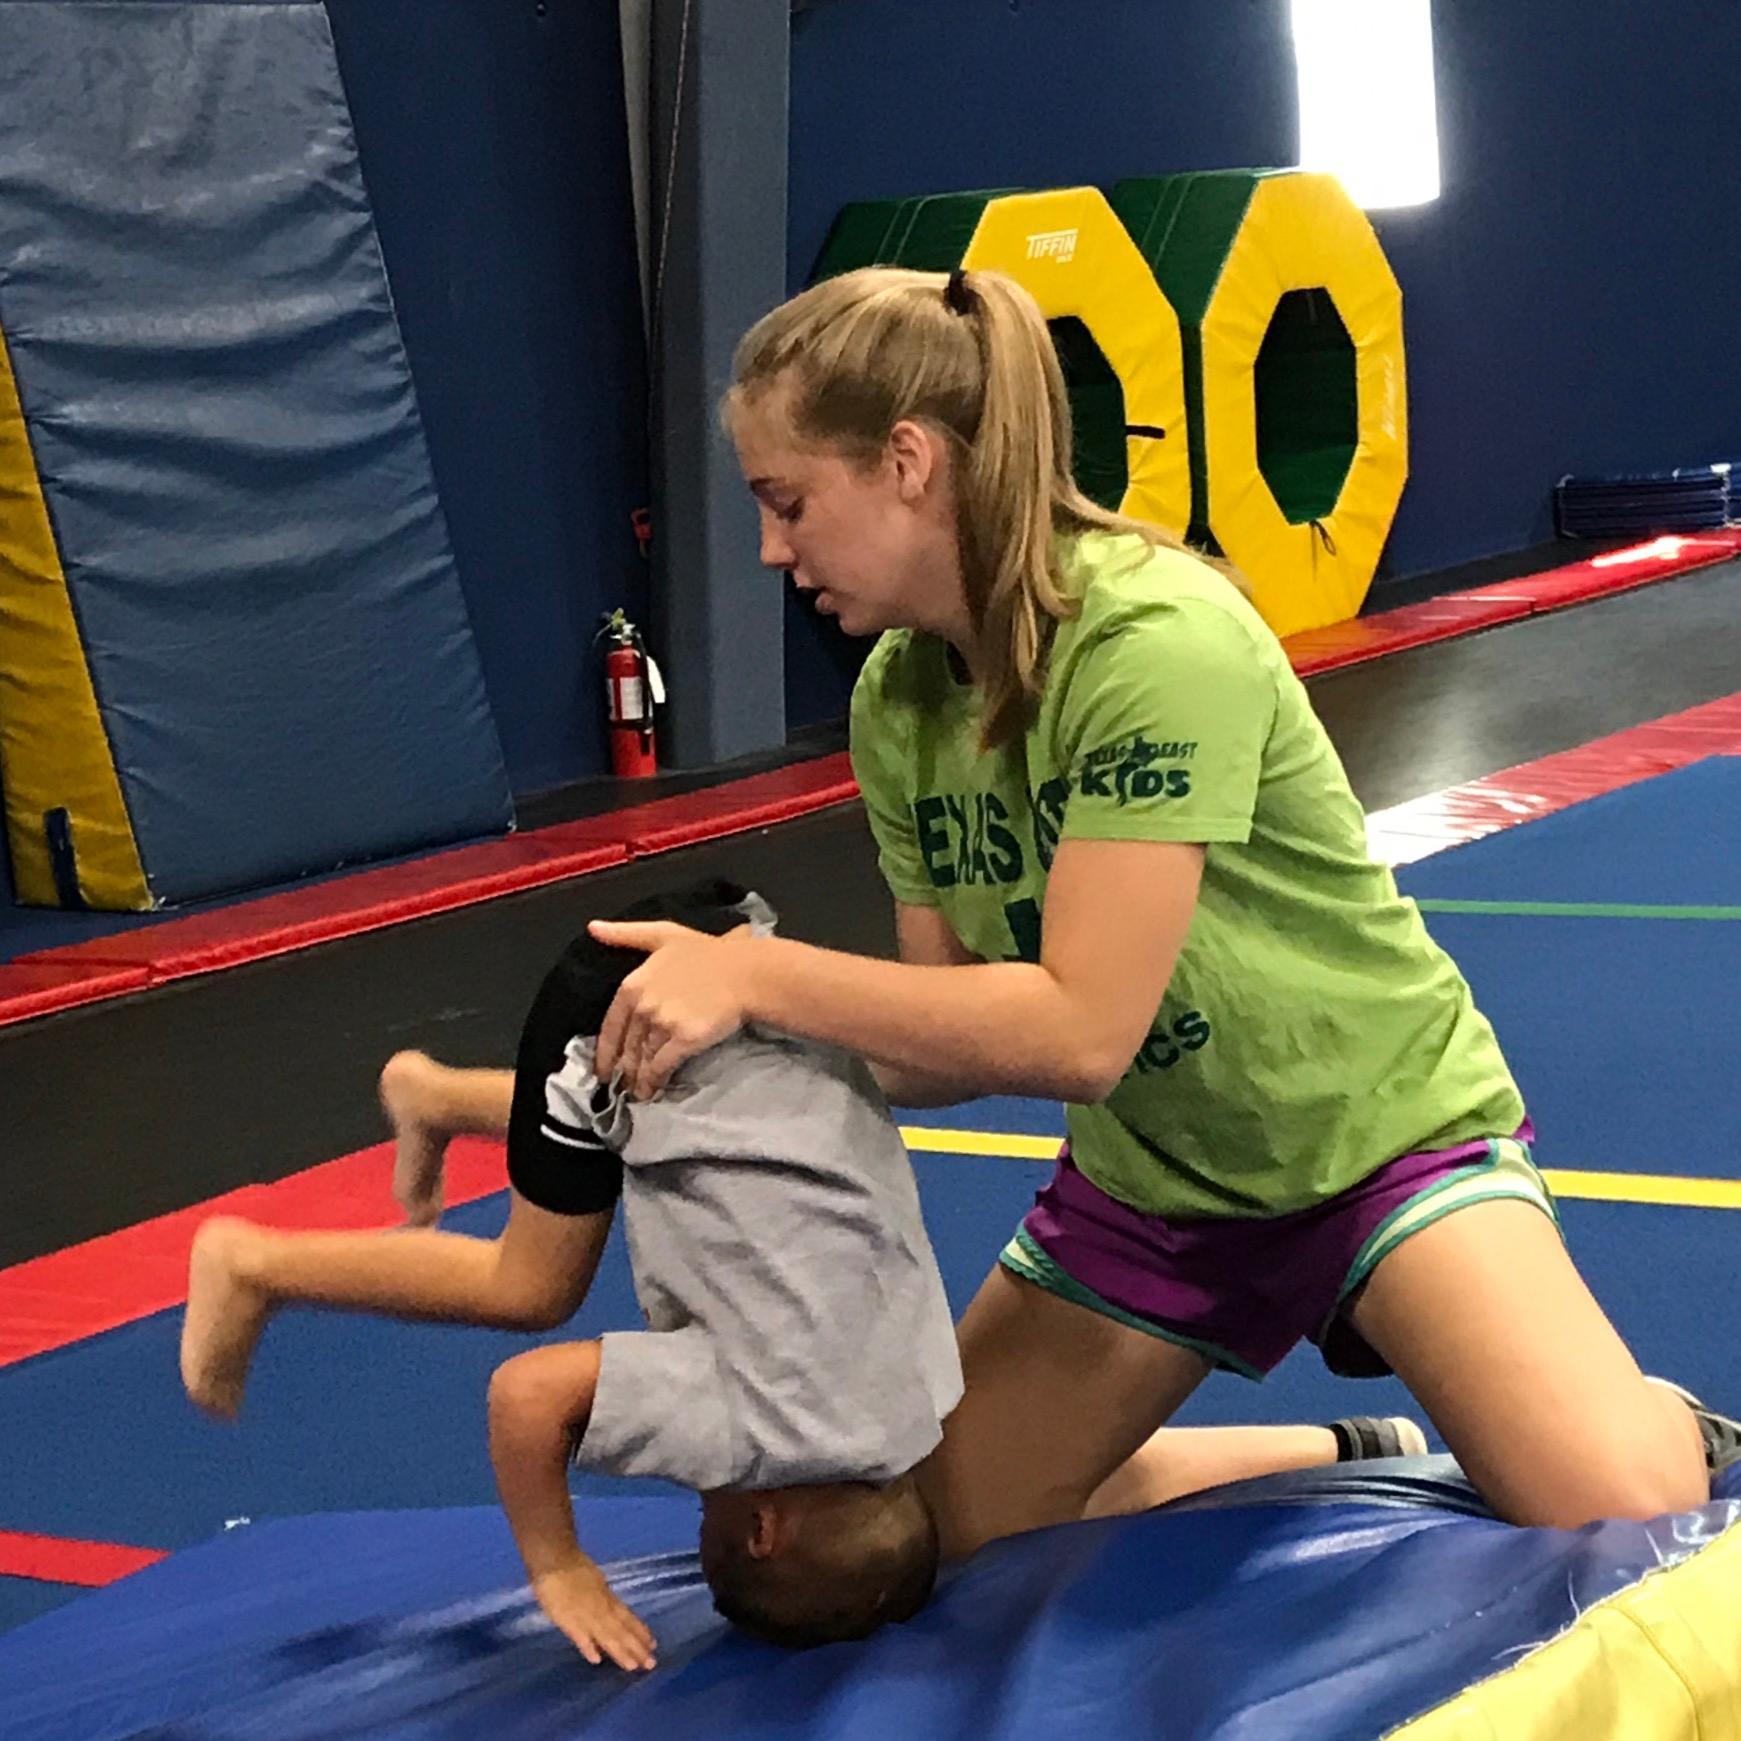 Texas East Gymnastics image 11